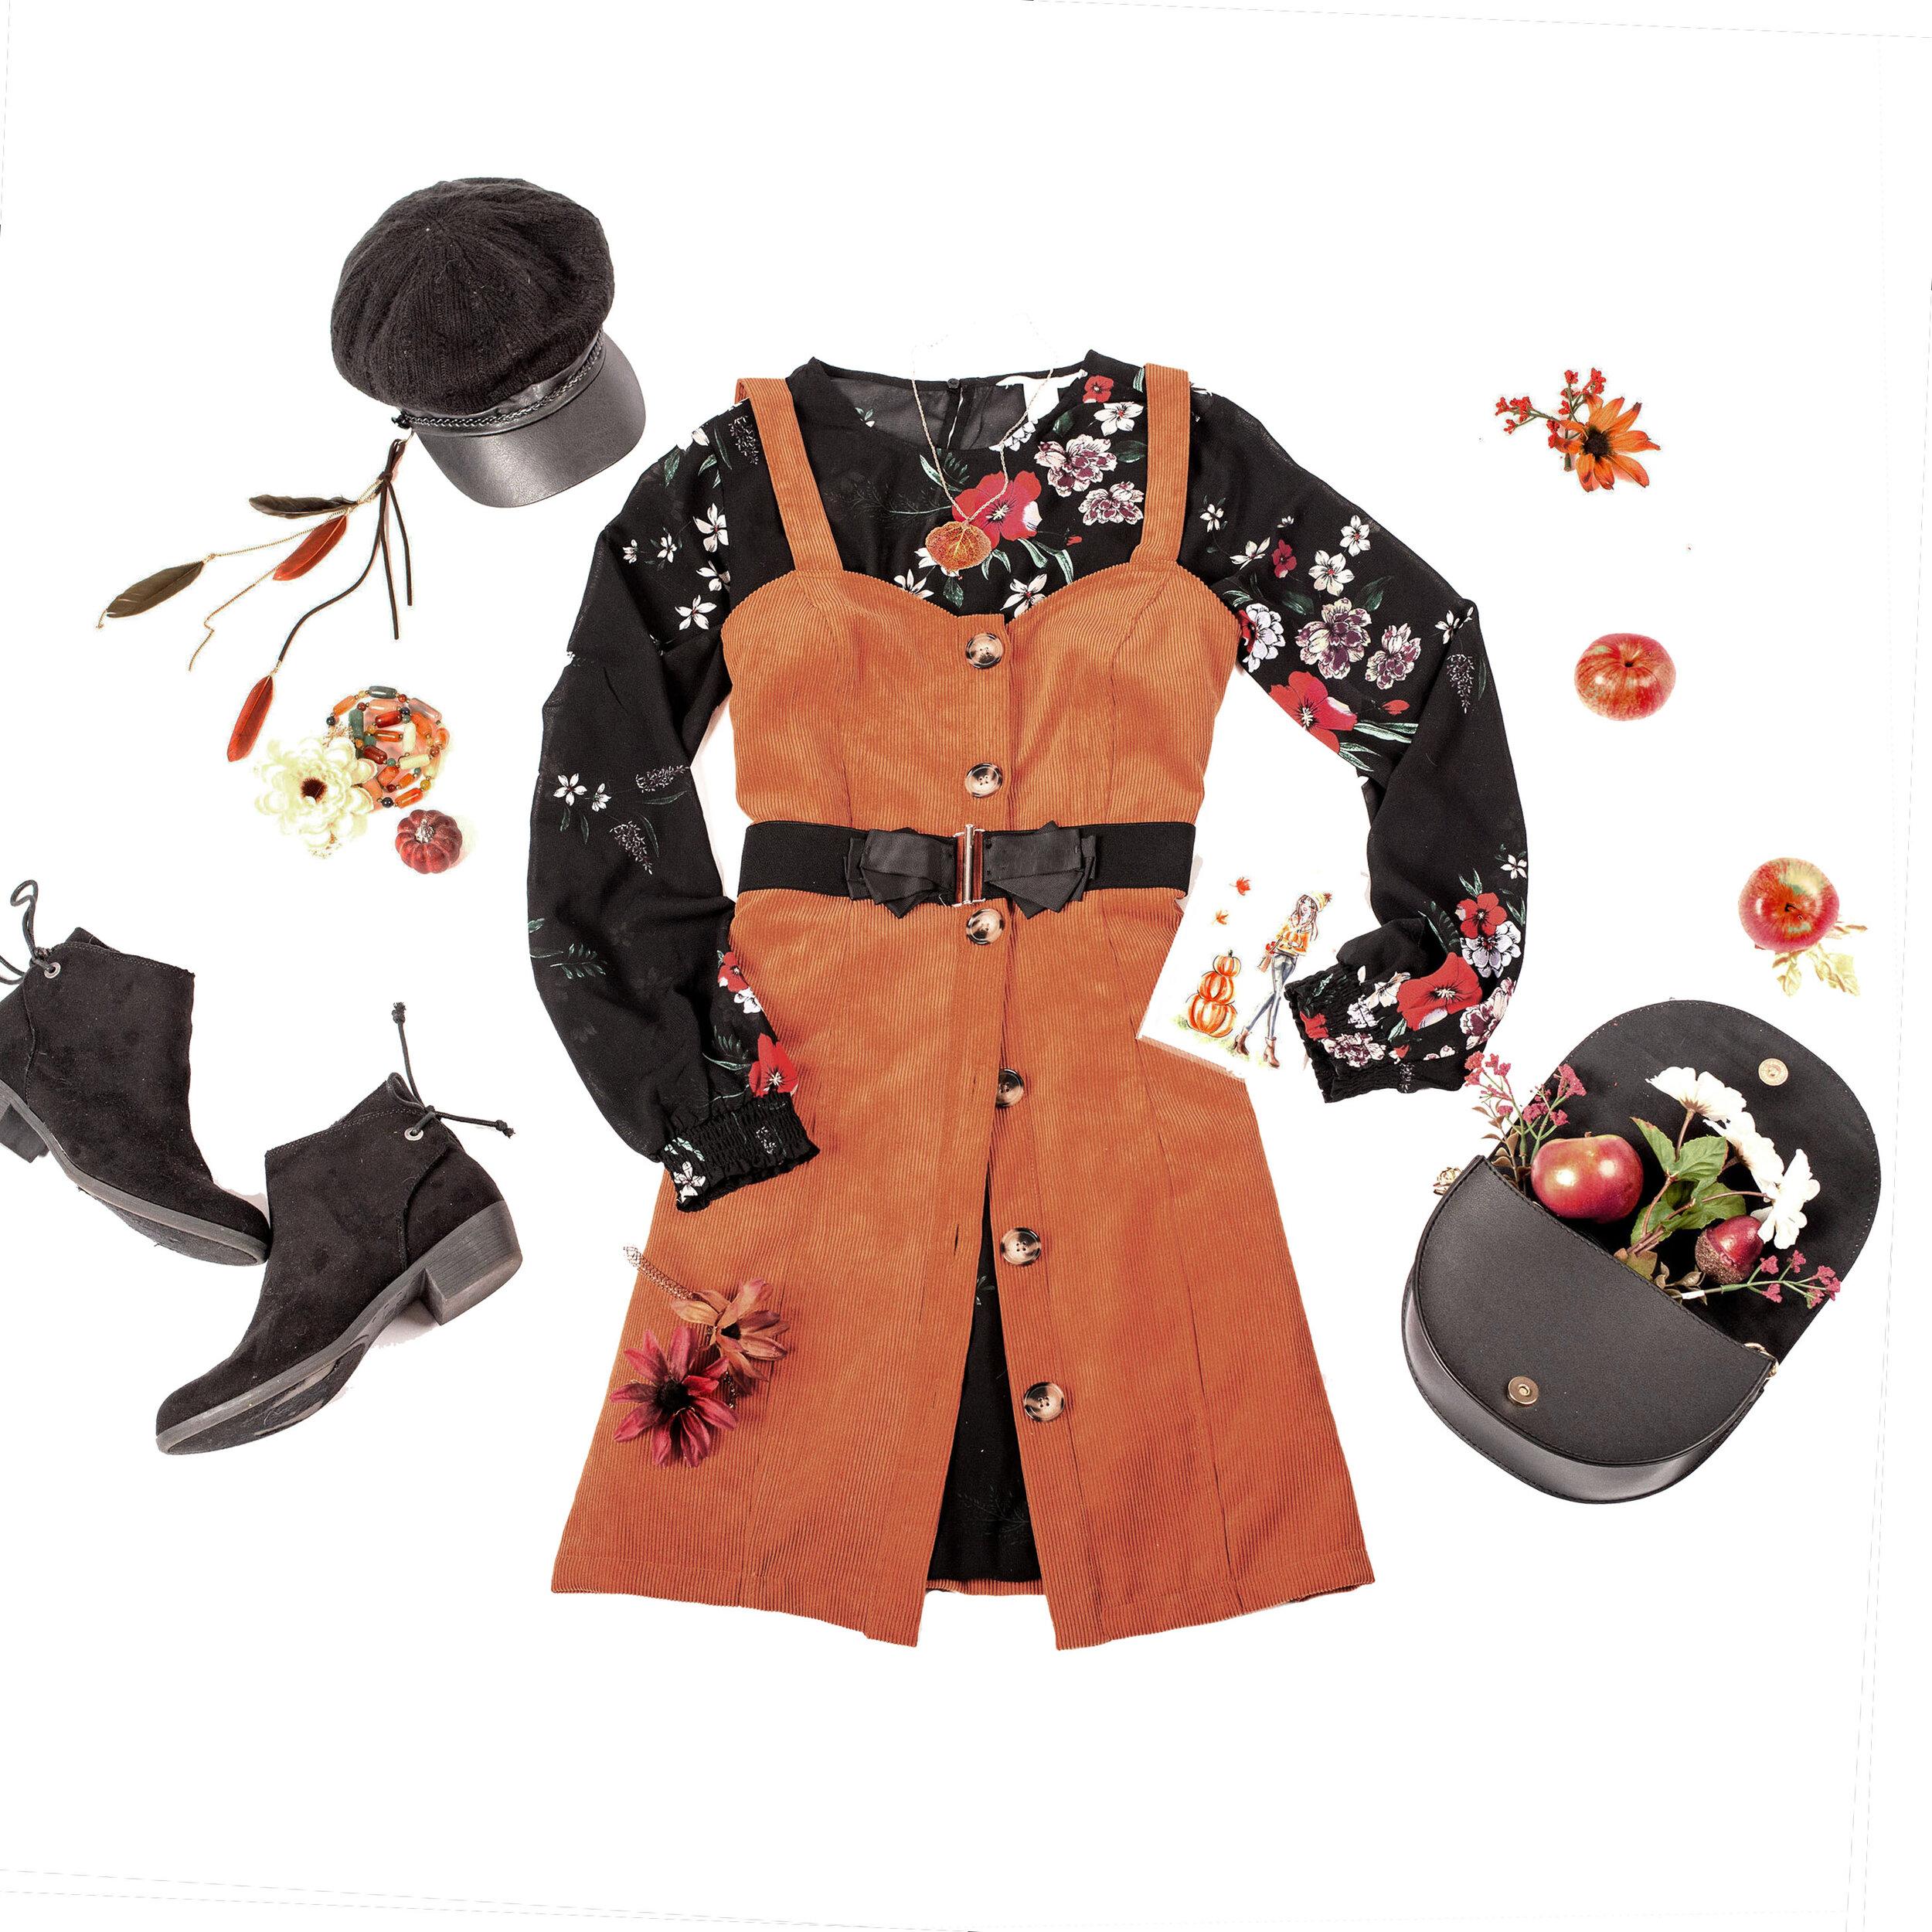 deanna kei meg zano Fall fashion styling outfit orange dress.jpg